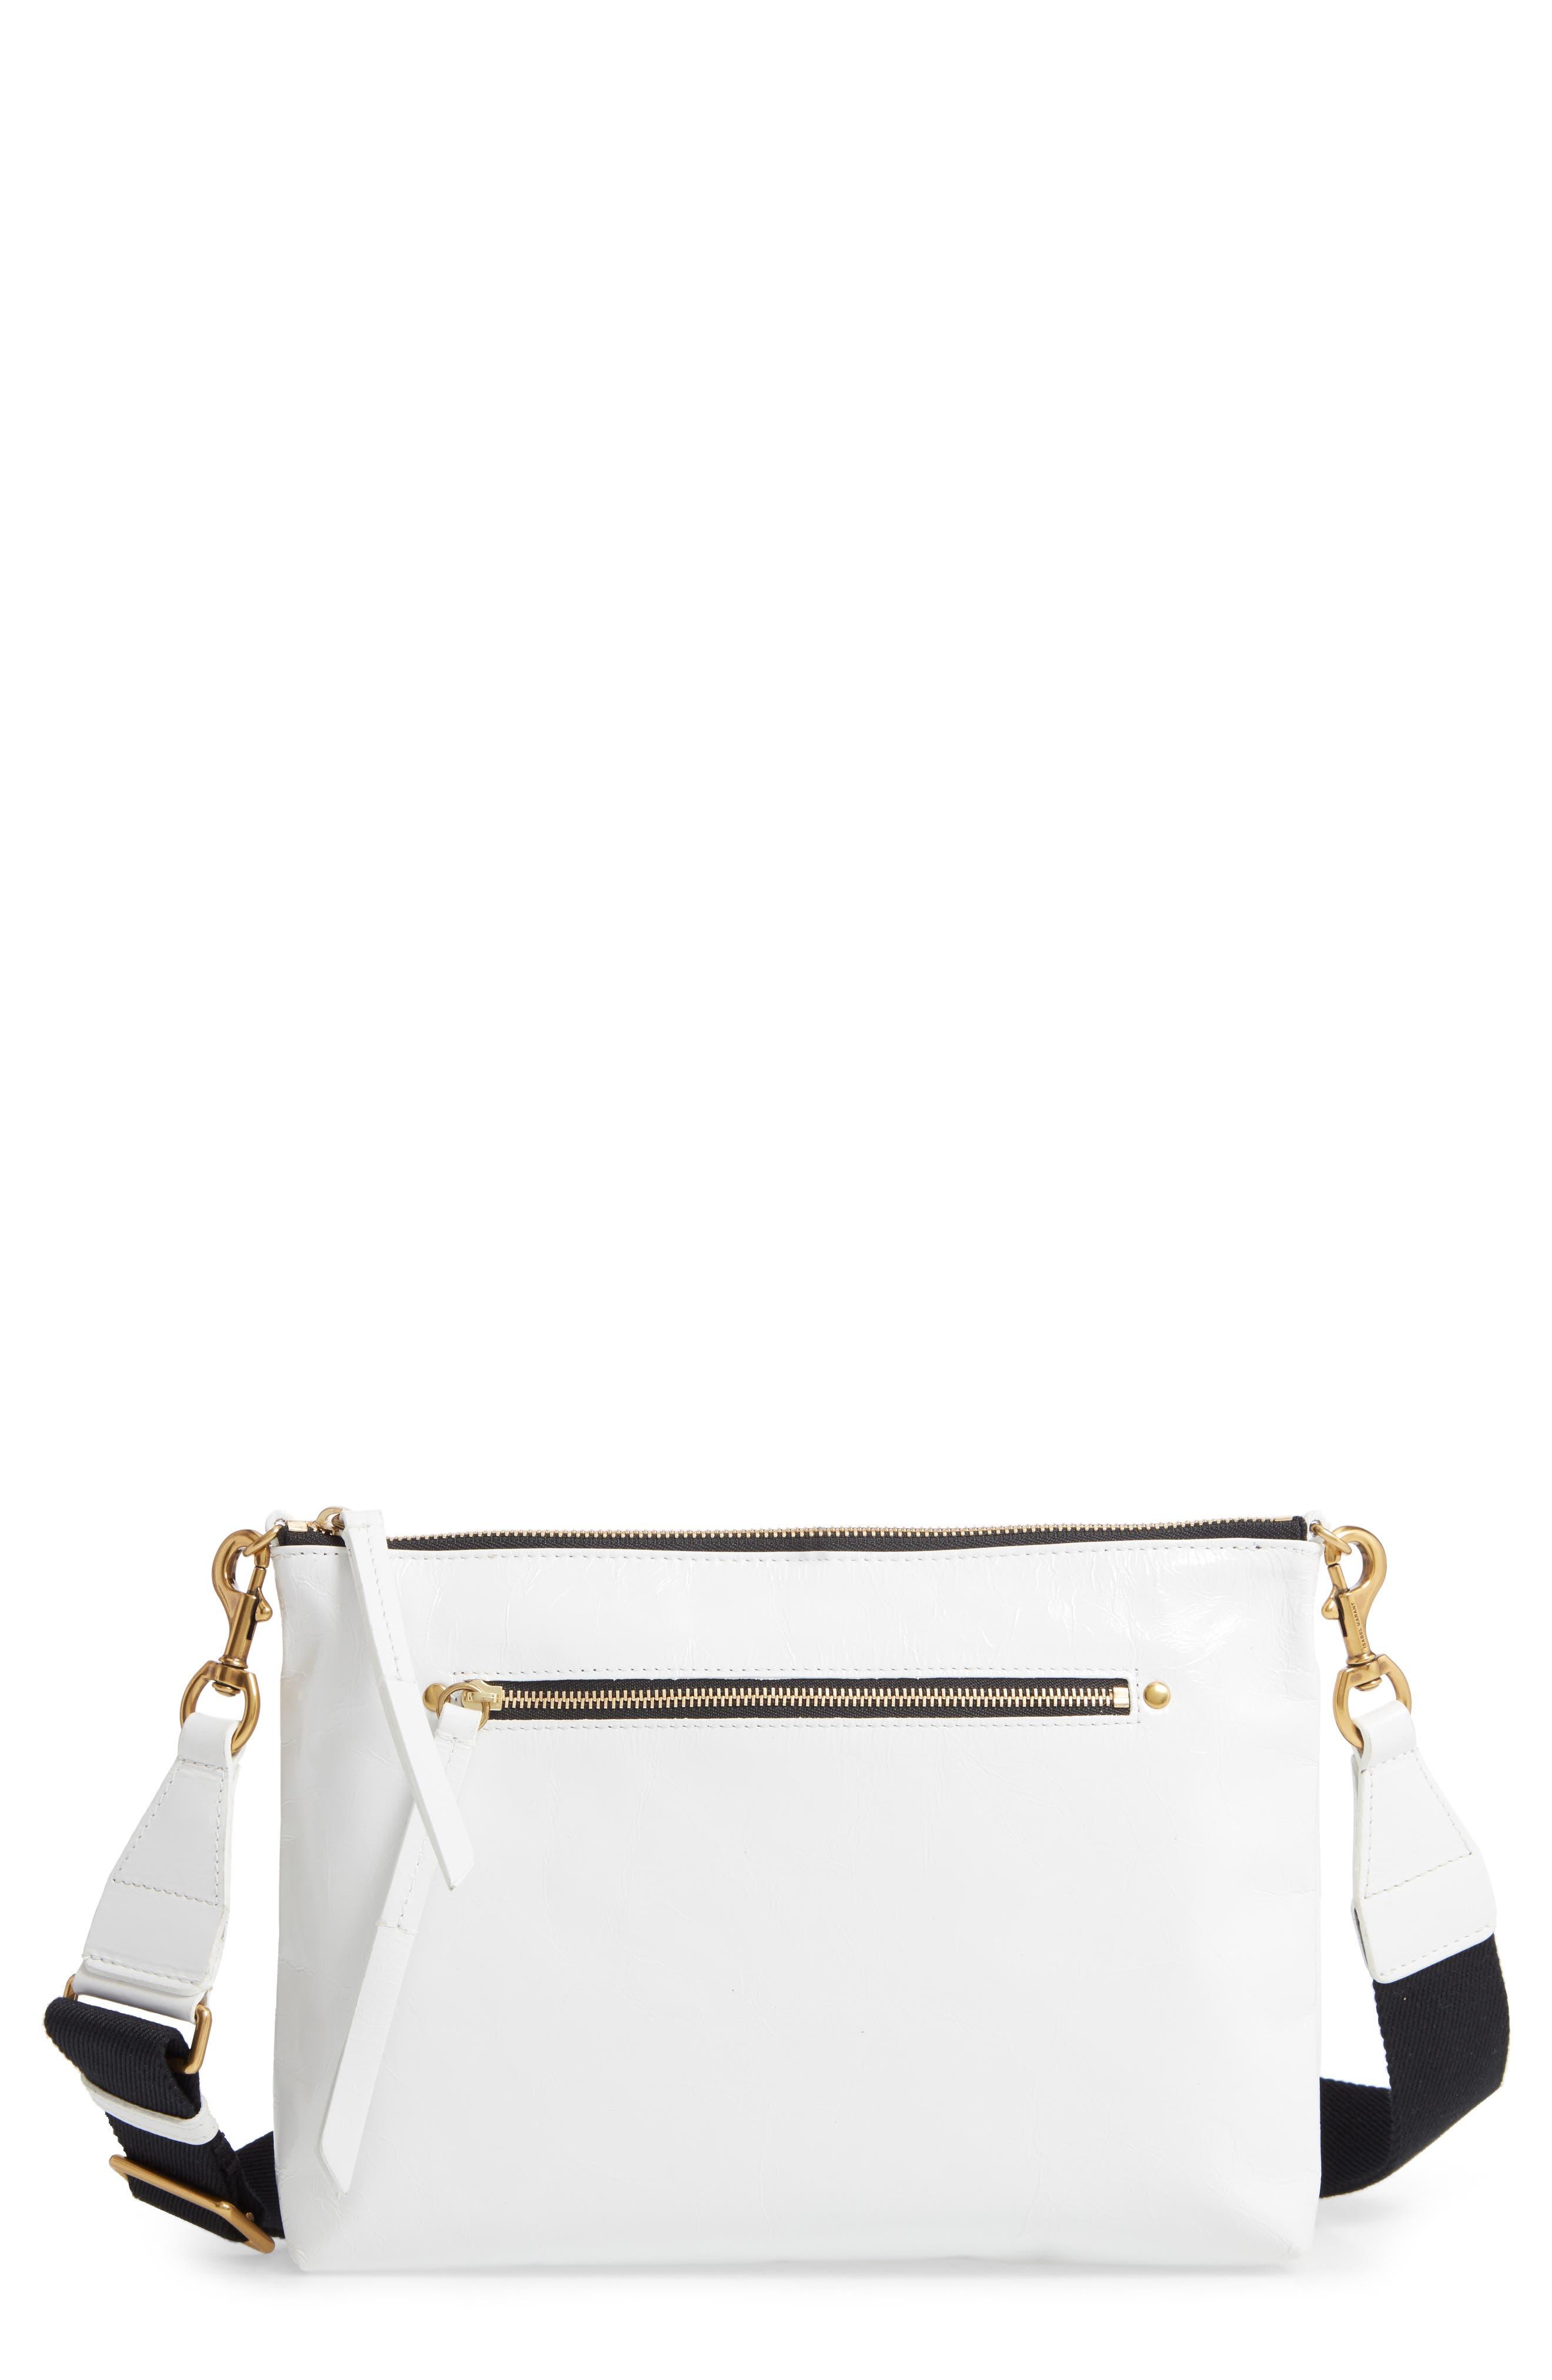 Isabel Marant New Nessah Calfskin Leather Crossbody Bag | Nordstrom